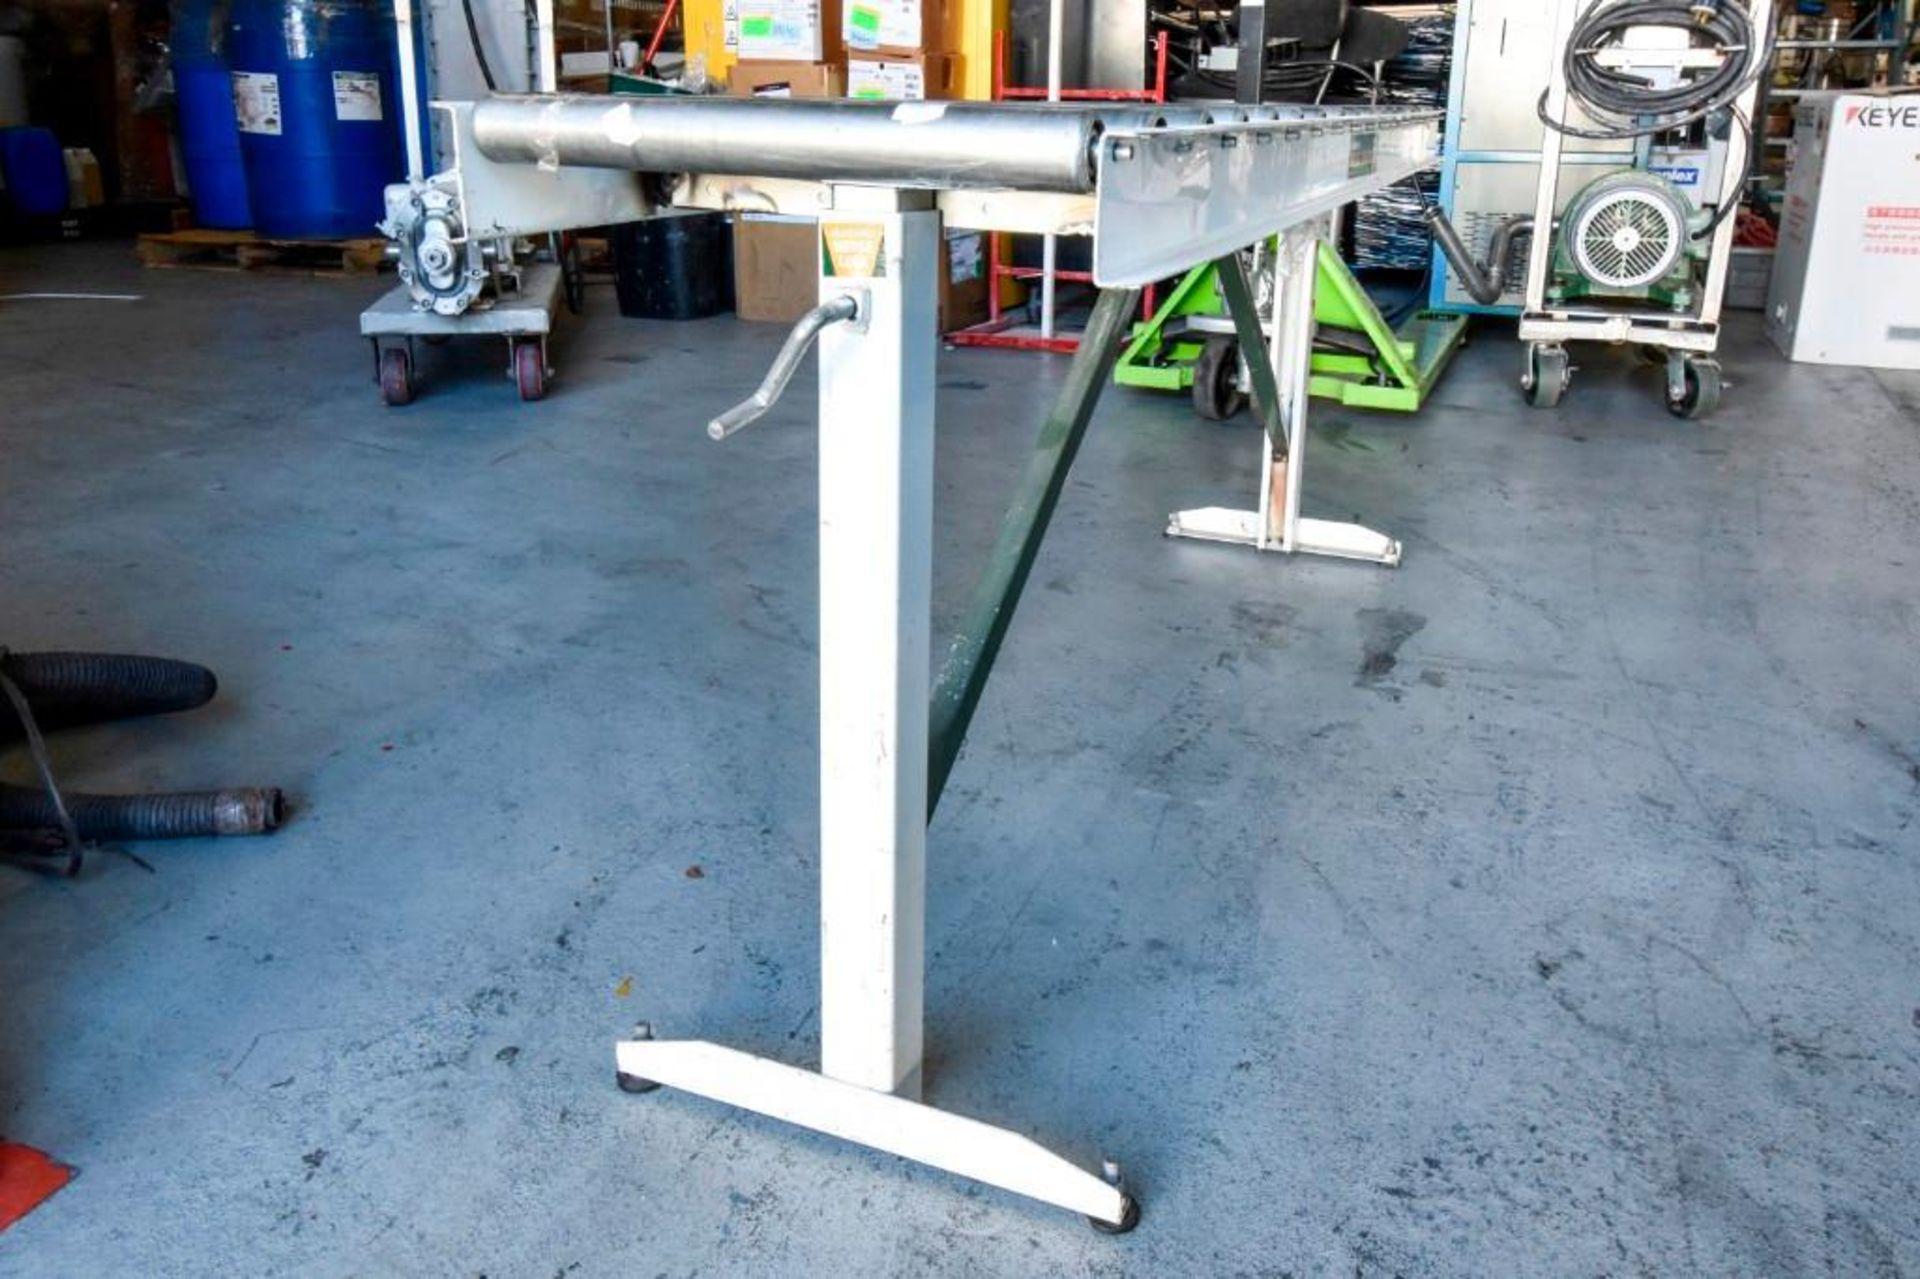 Super Duty Portable Folding Roller Conveyor 5'7'' - Image 10 of 11